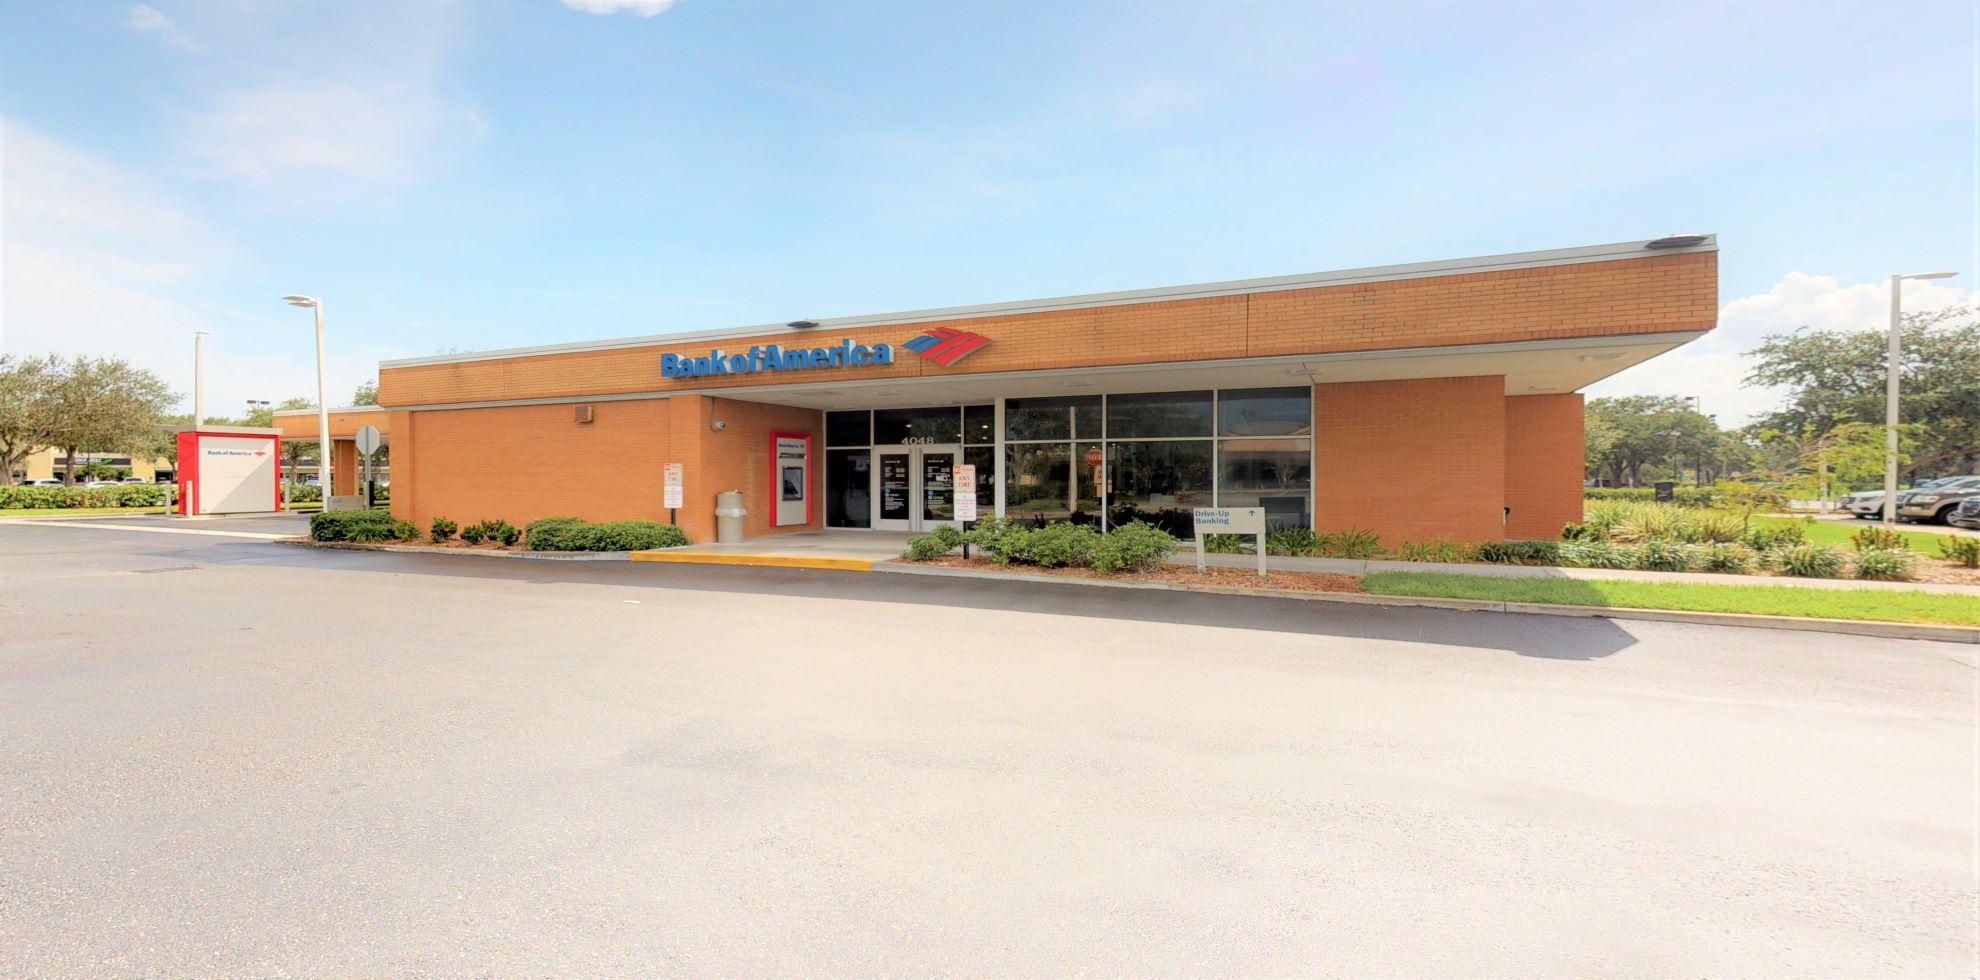 Bank of America financial center with drive-thru ATM   4048 Town Center Blvd, Orlando, FL 32837